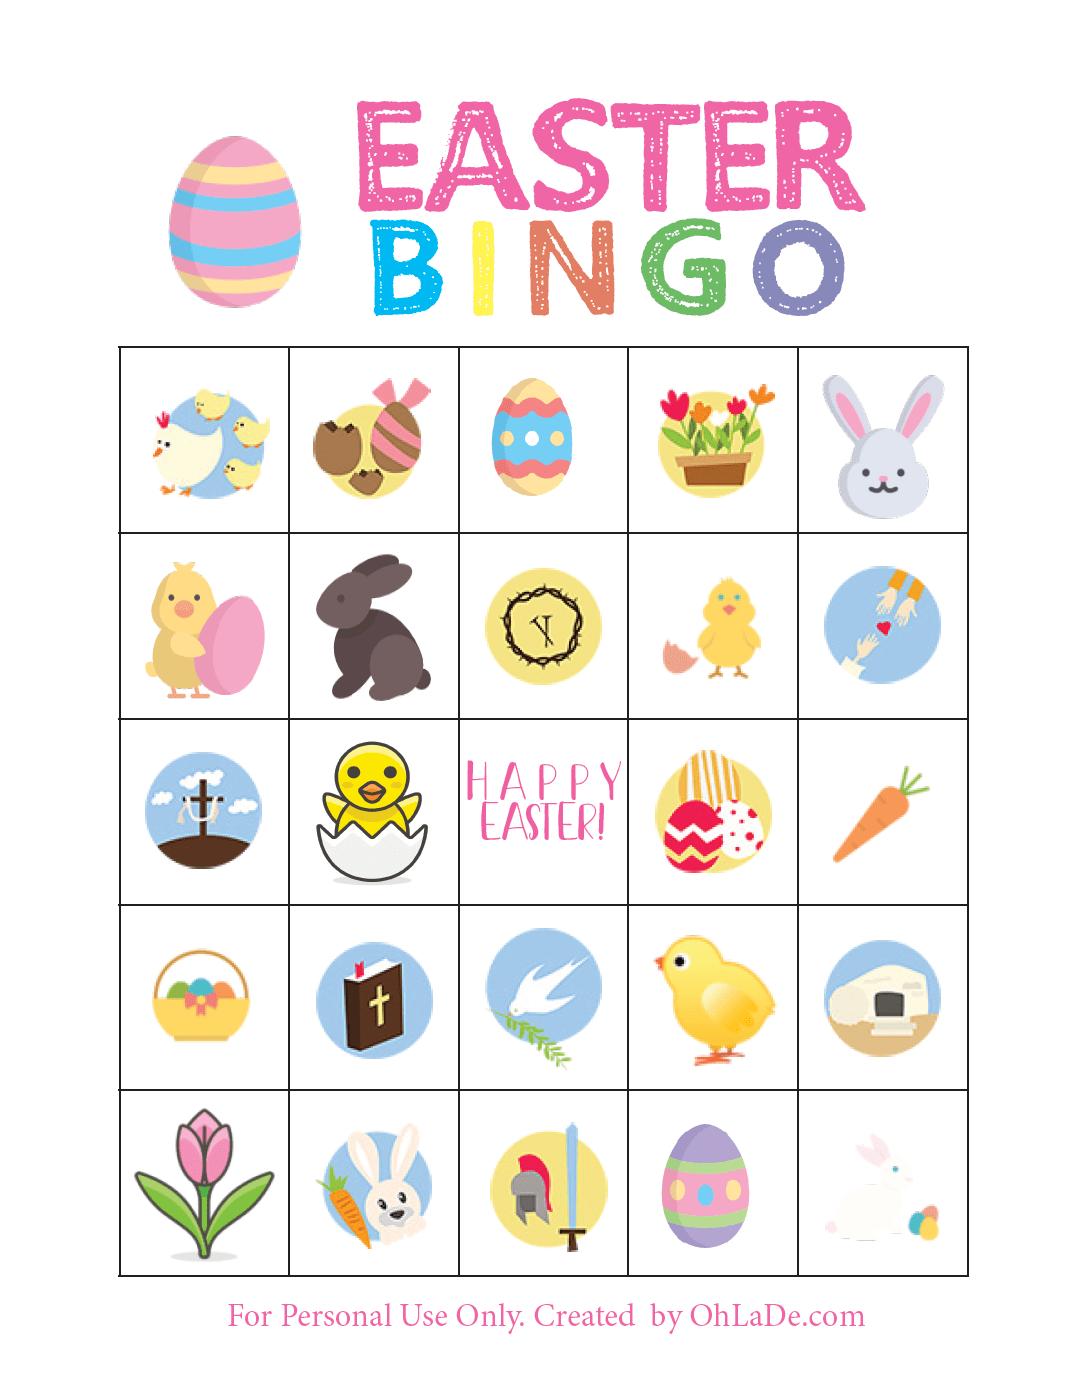 photograph about Free Printable Easter Bingo Cards known as Enjoyable Printable Easter Bingo Video game Oh La De